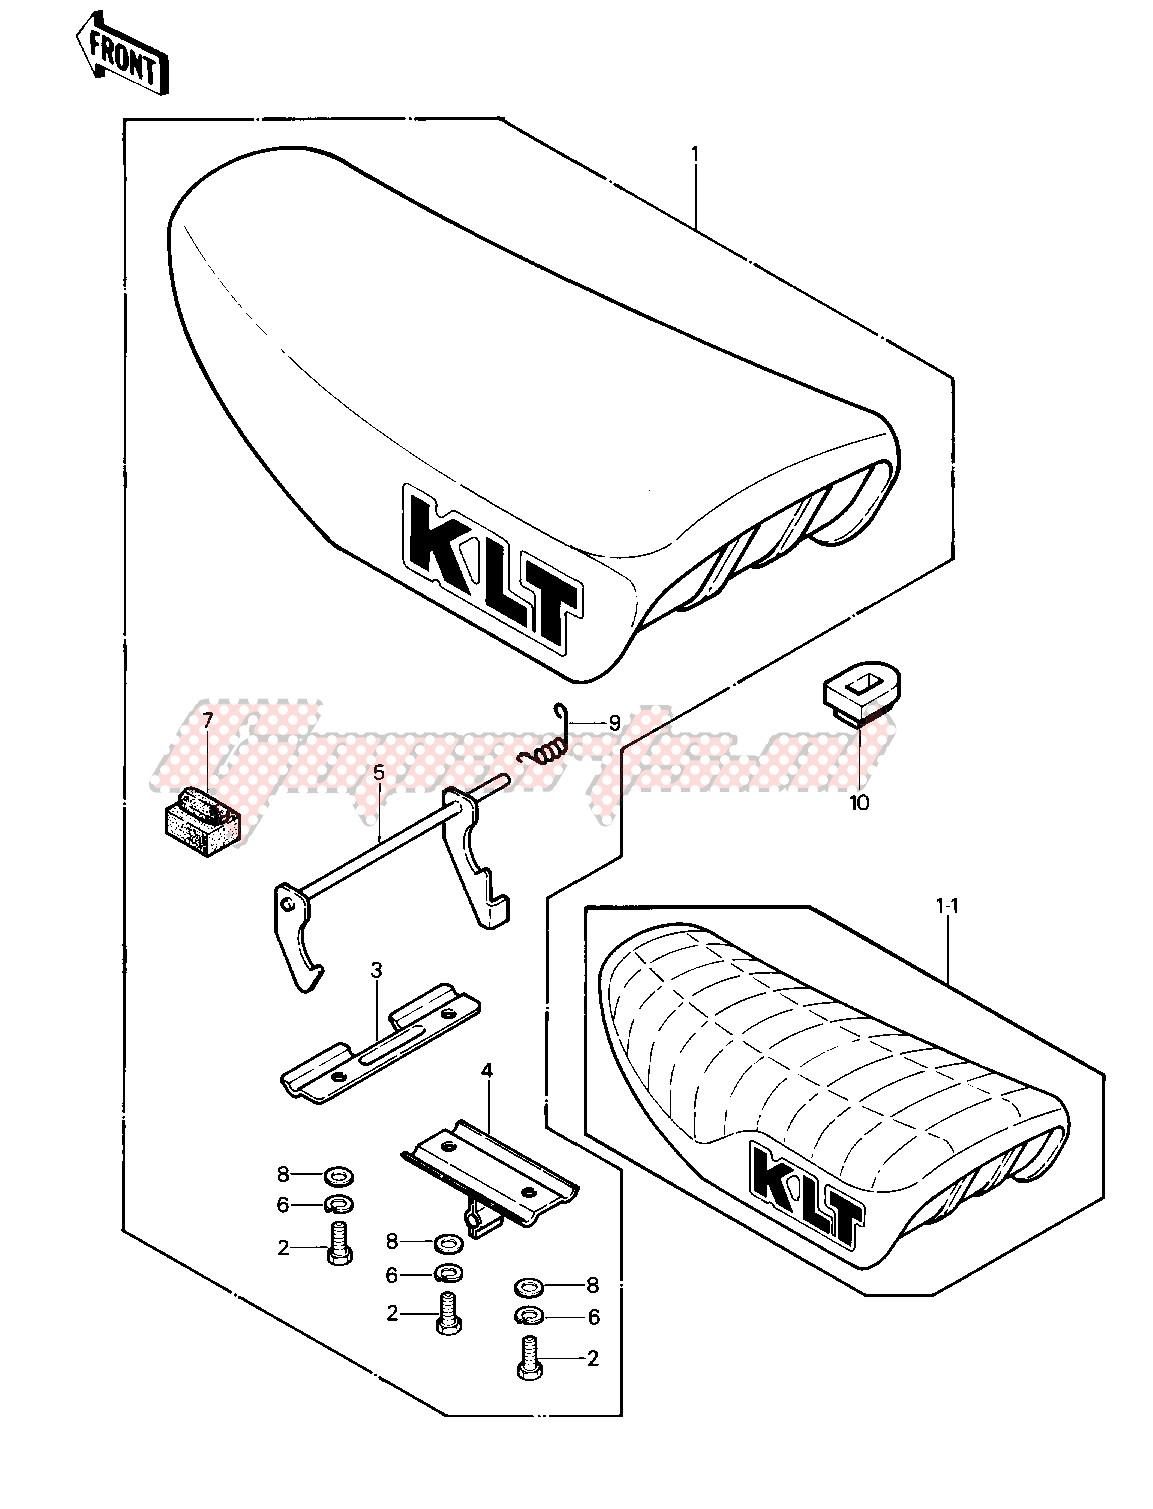 SEAT -- 81-82 KLT200-A1_A2_A3- - image